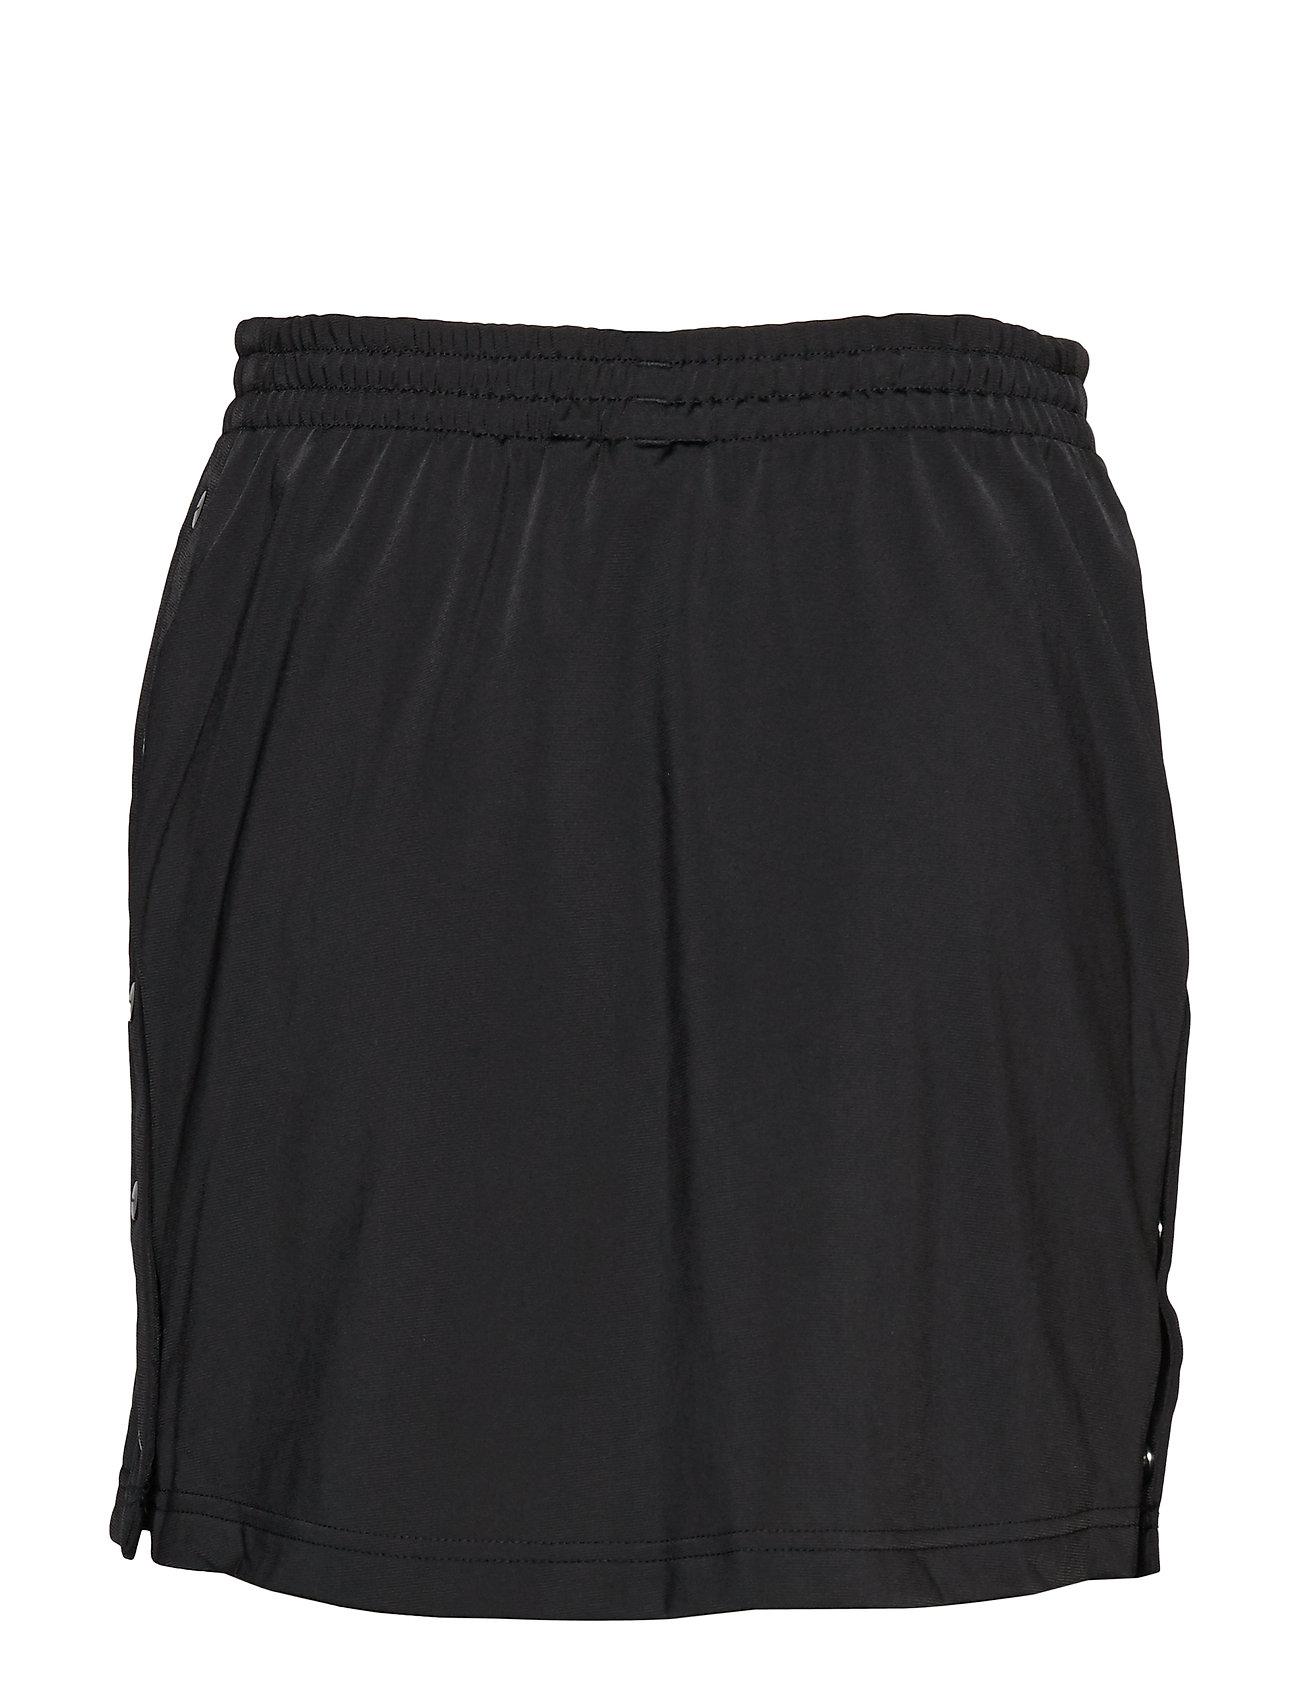 Sc Skirt Kort Nederdel Sort ADIDAS ORIGINALS